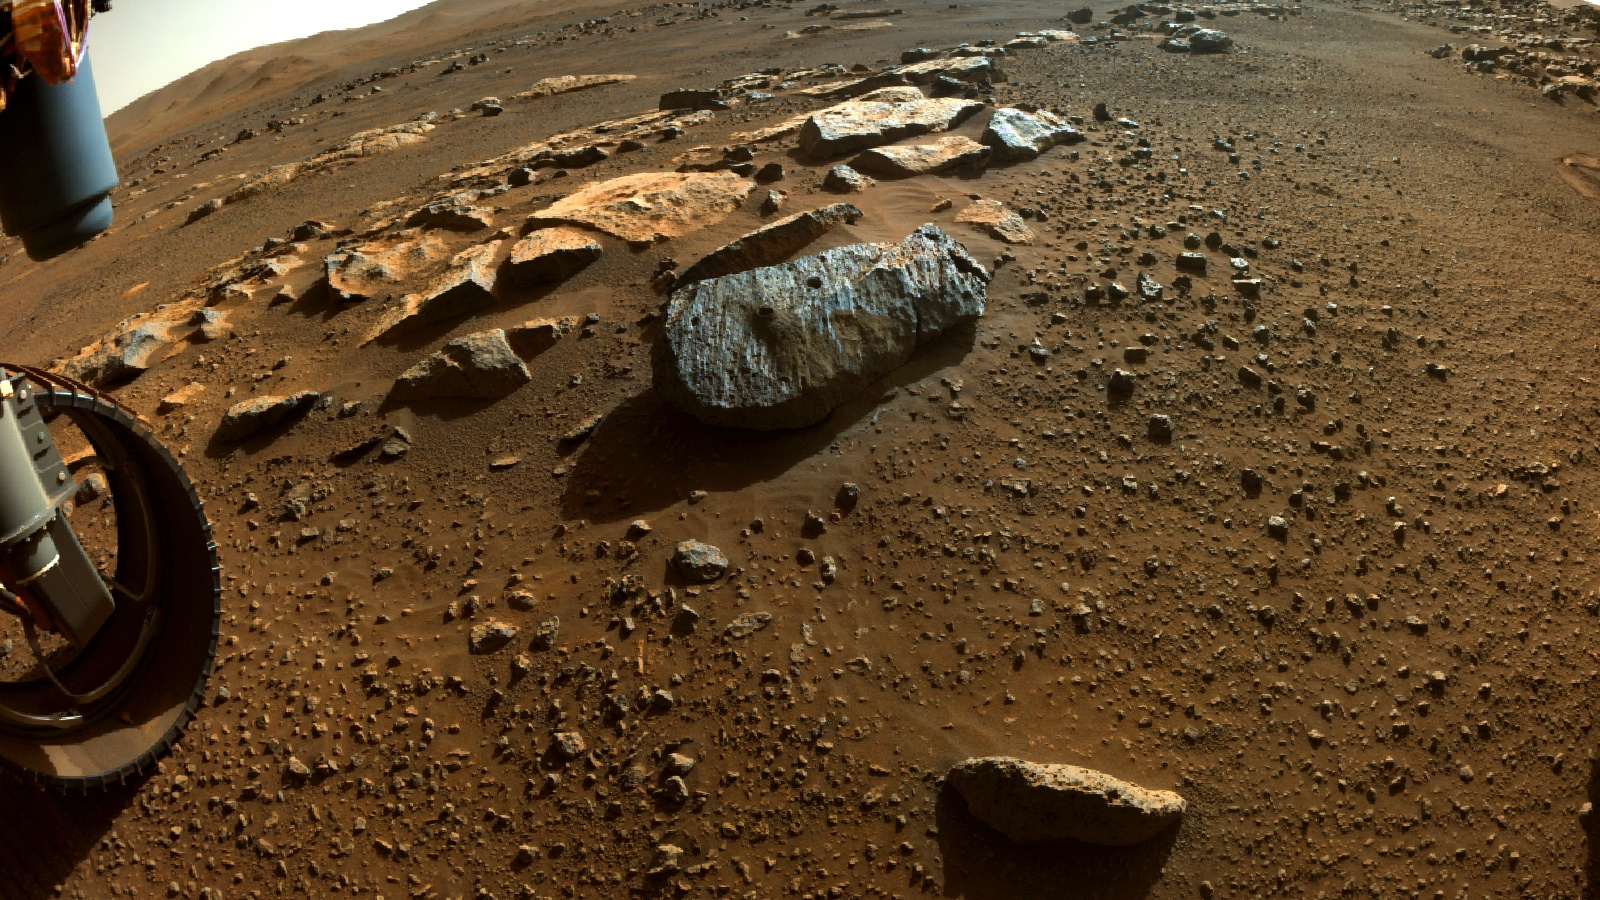 Puzzle Pieces of Mars